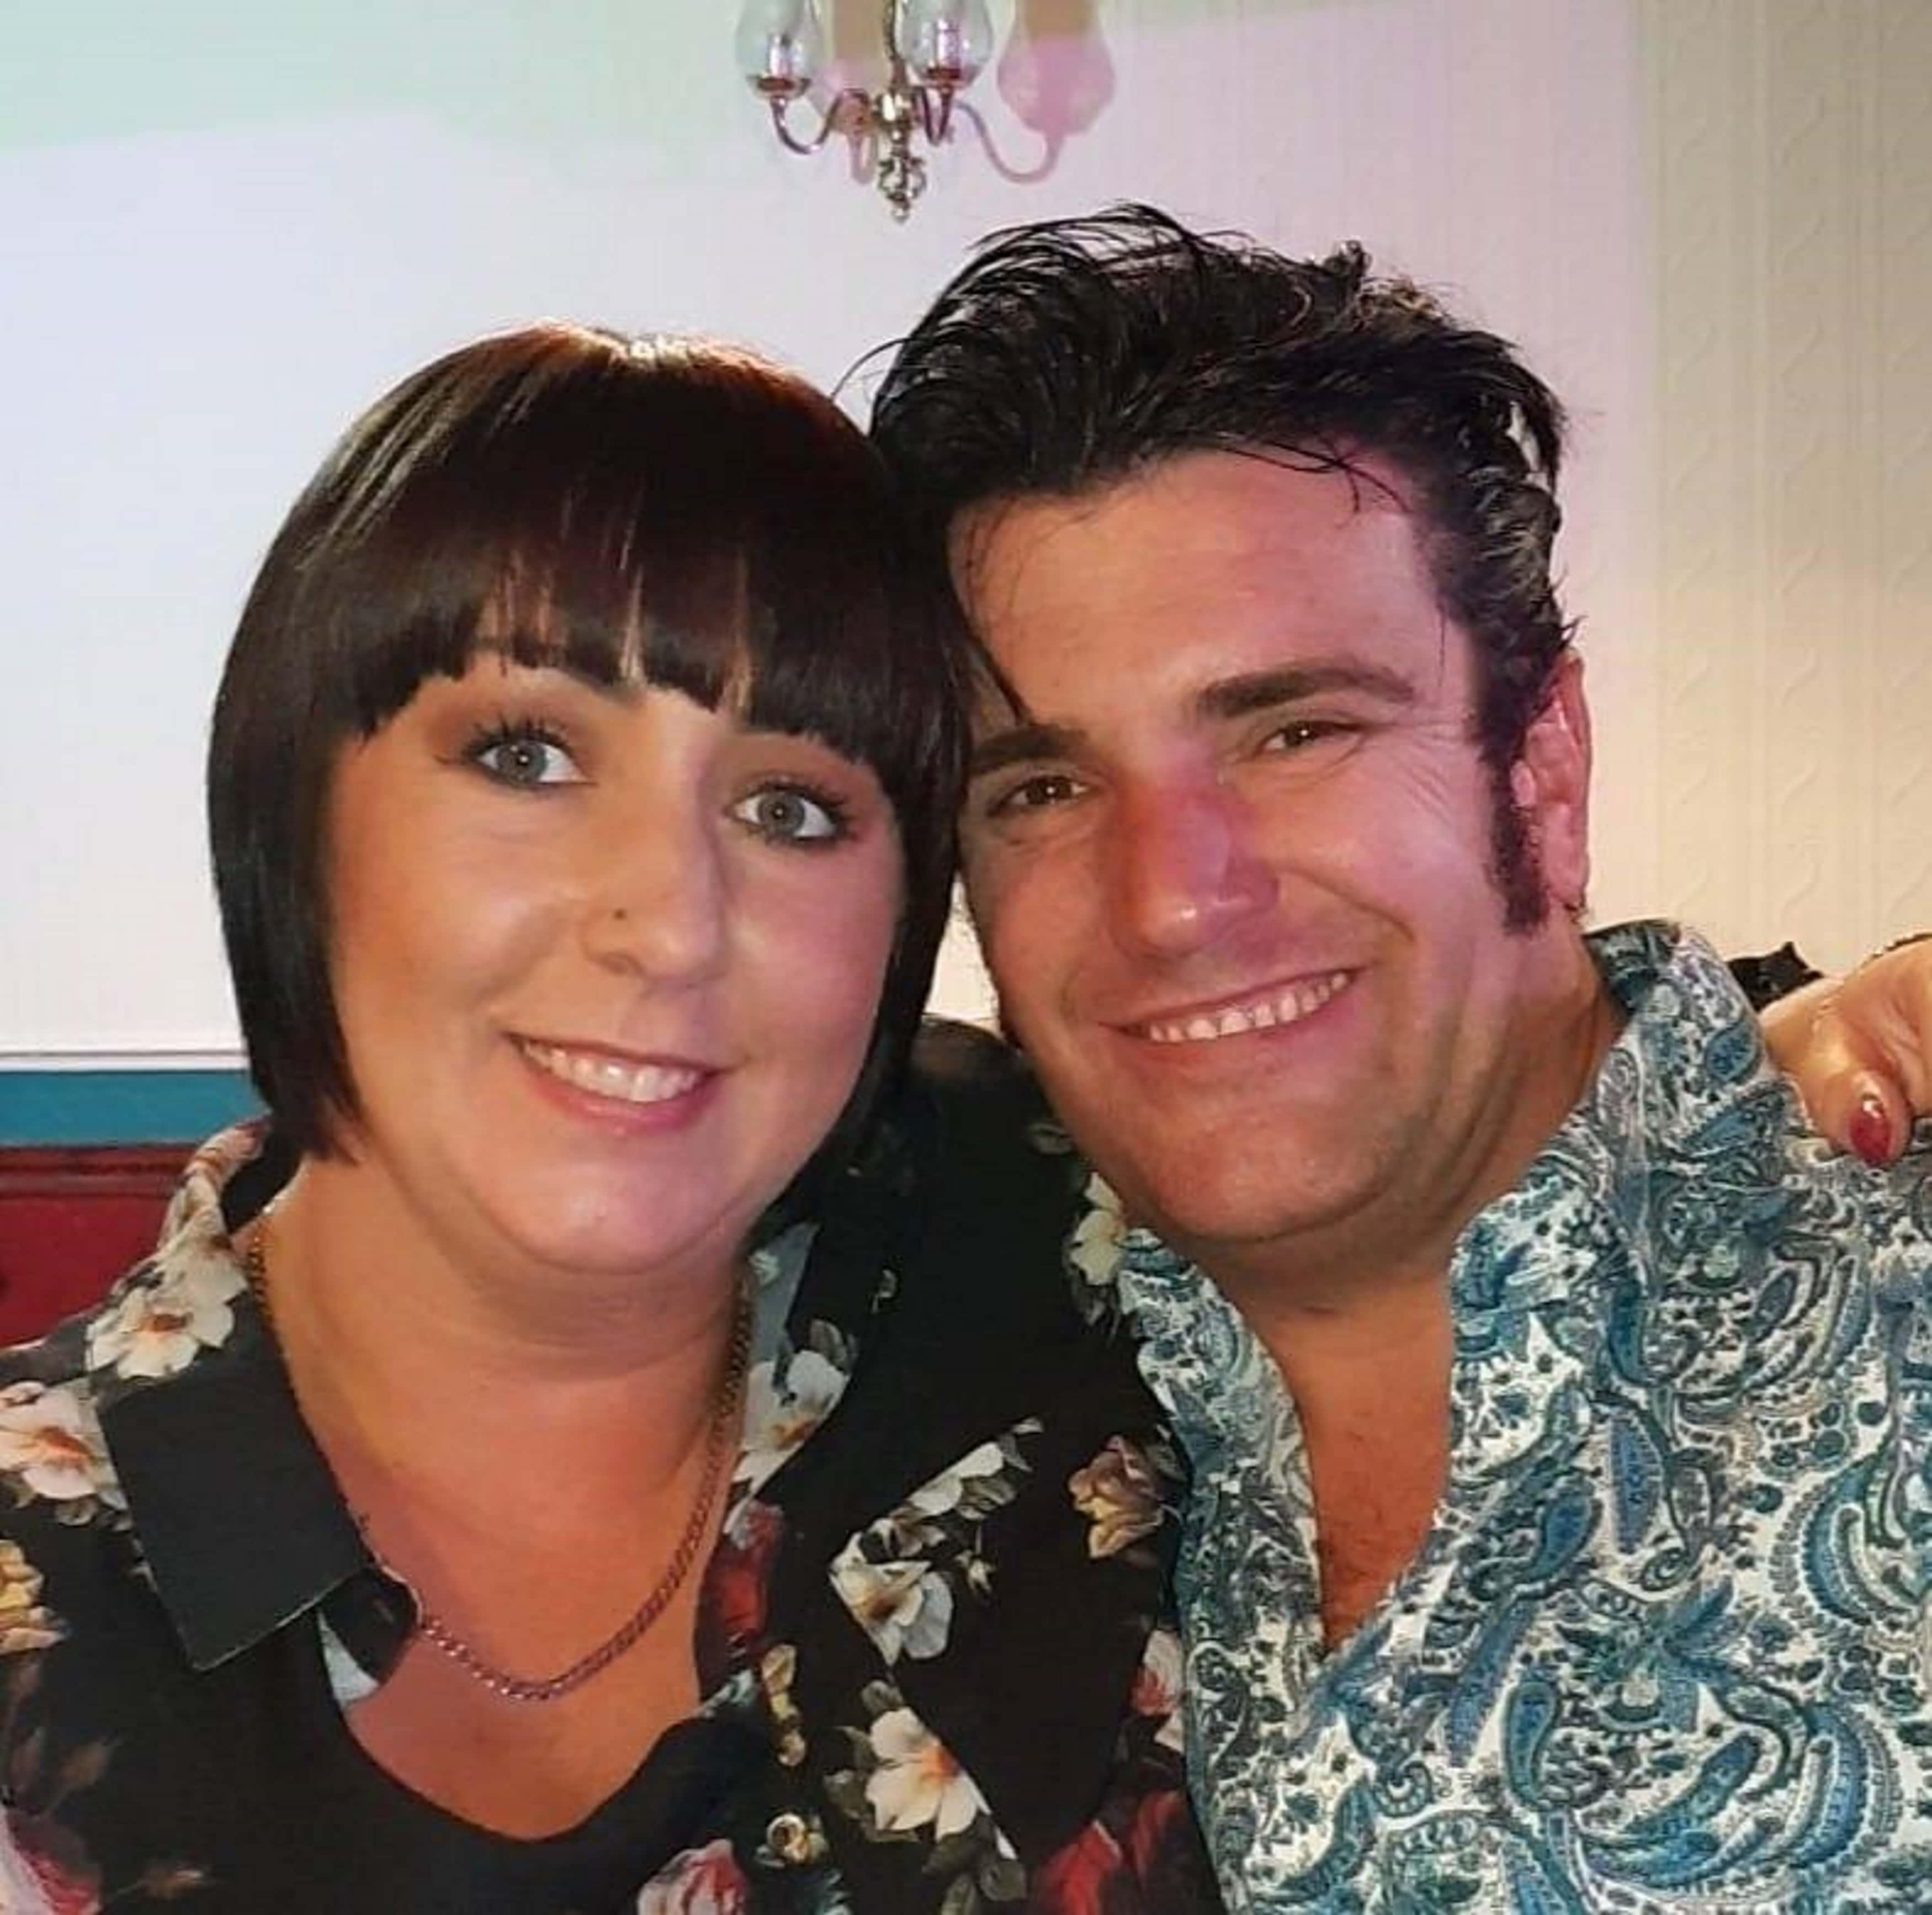 Elvis tribute artist Lee Grindey, 41, with his wife